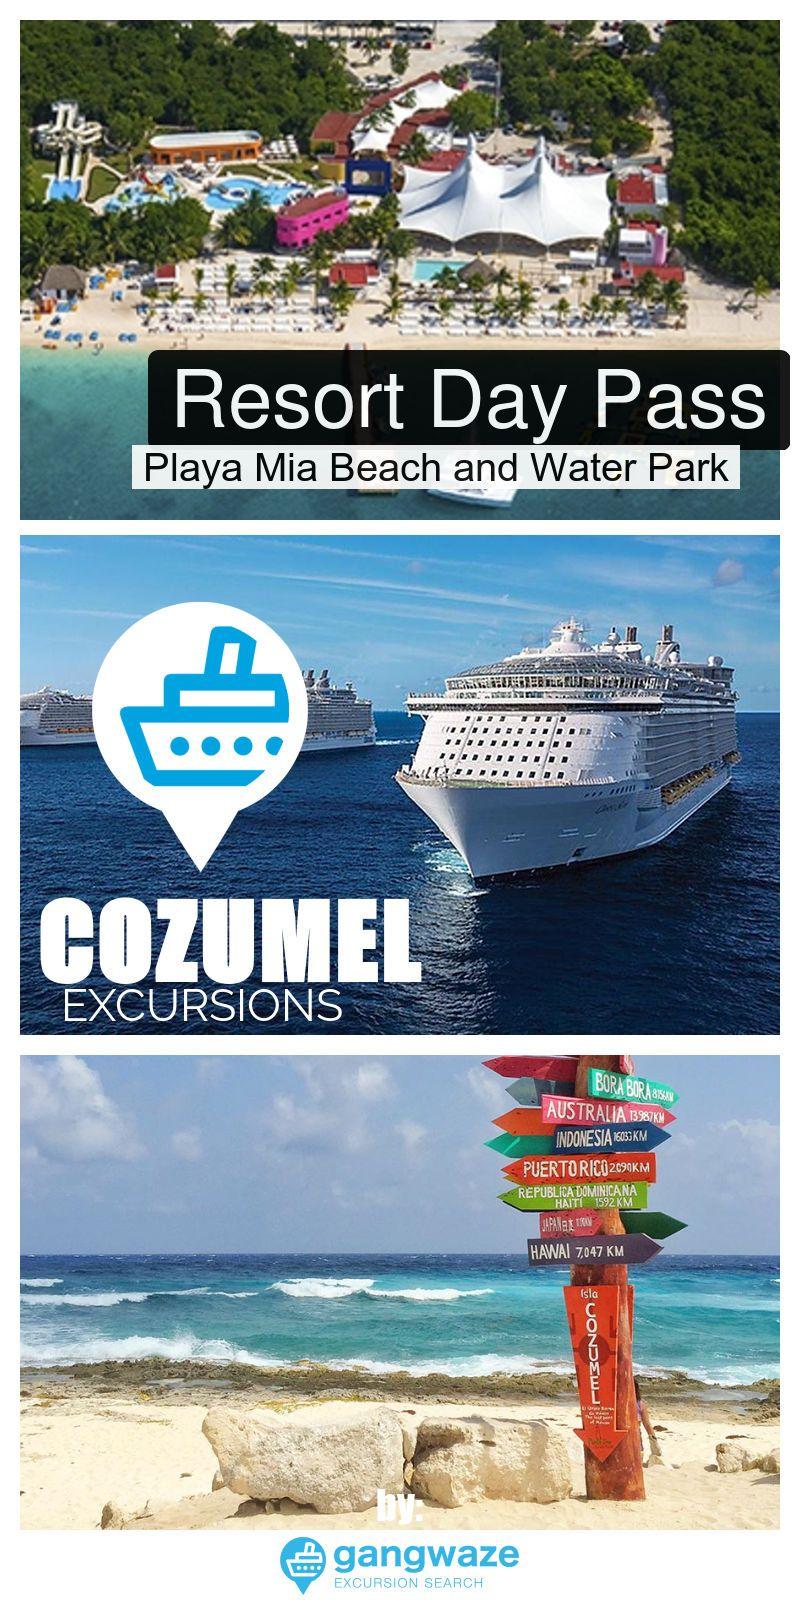 Resort Day Pass Playa Mia Beach Water Park Cruise Excursion